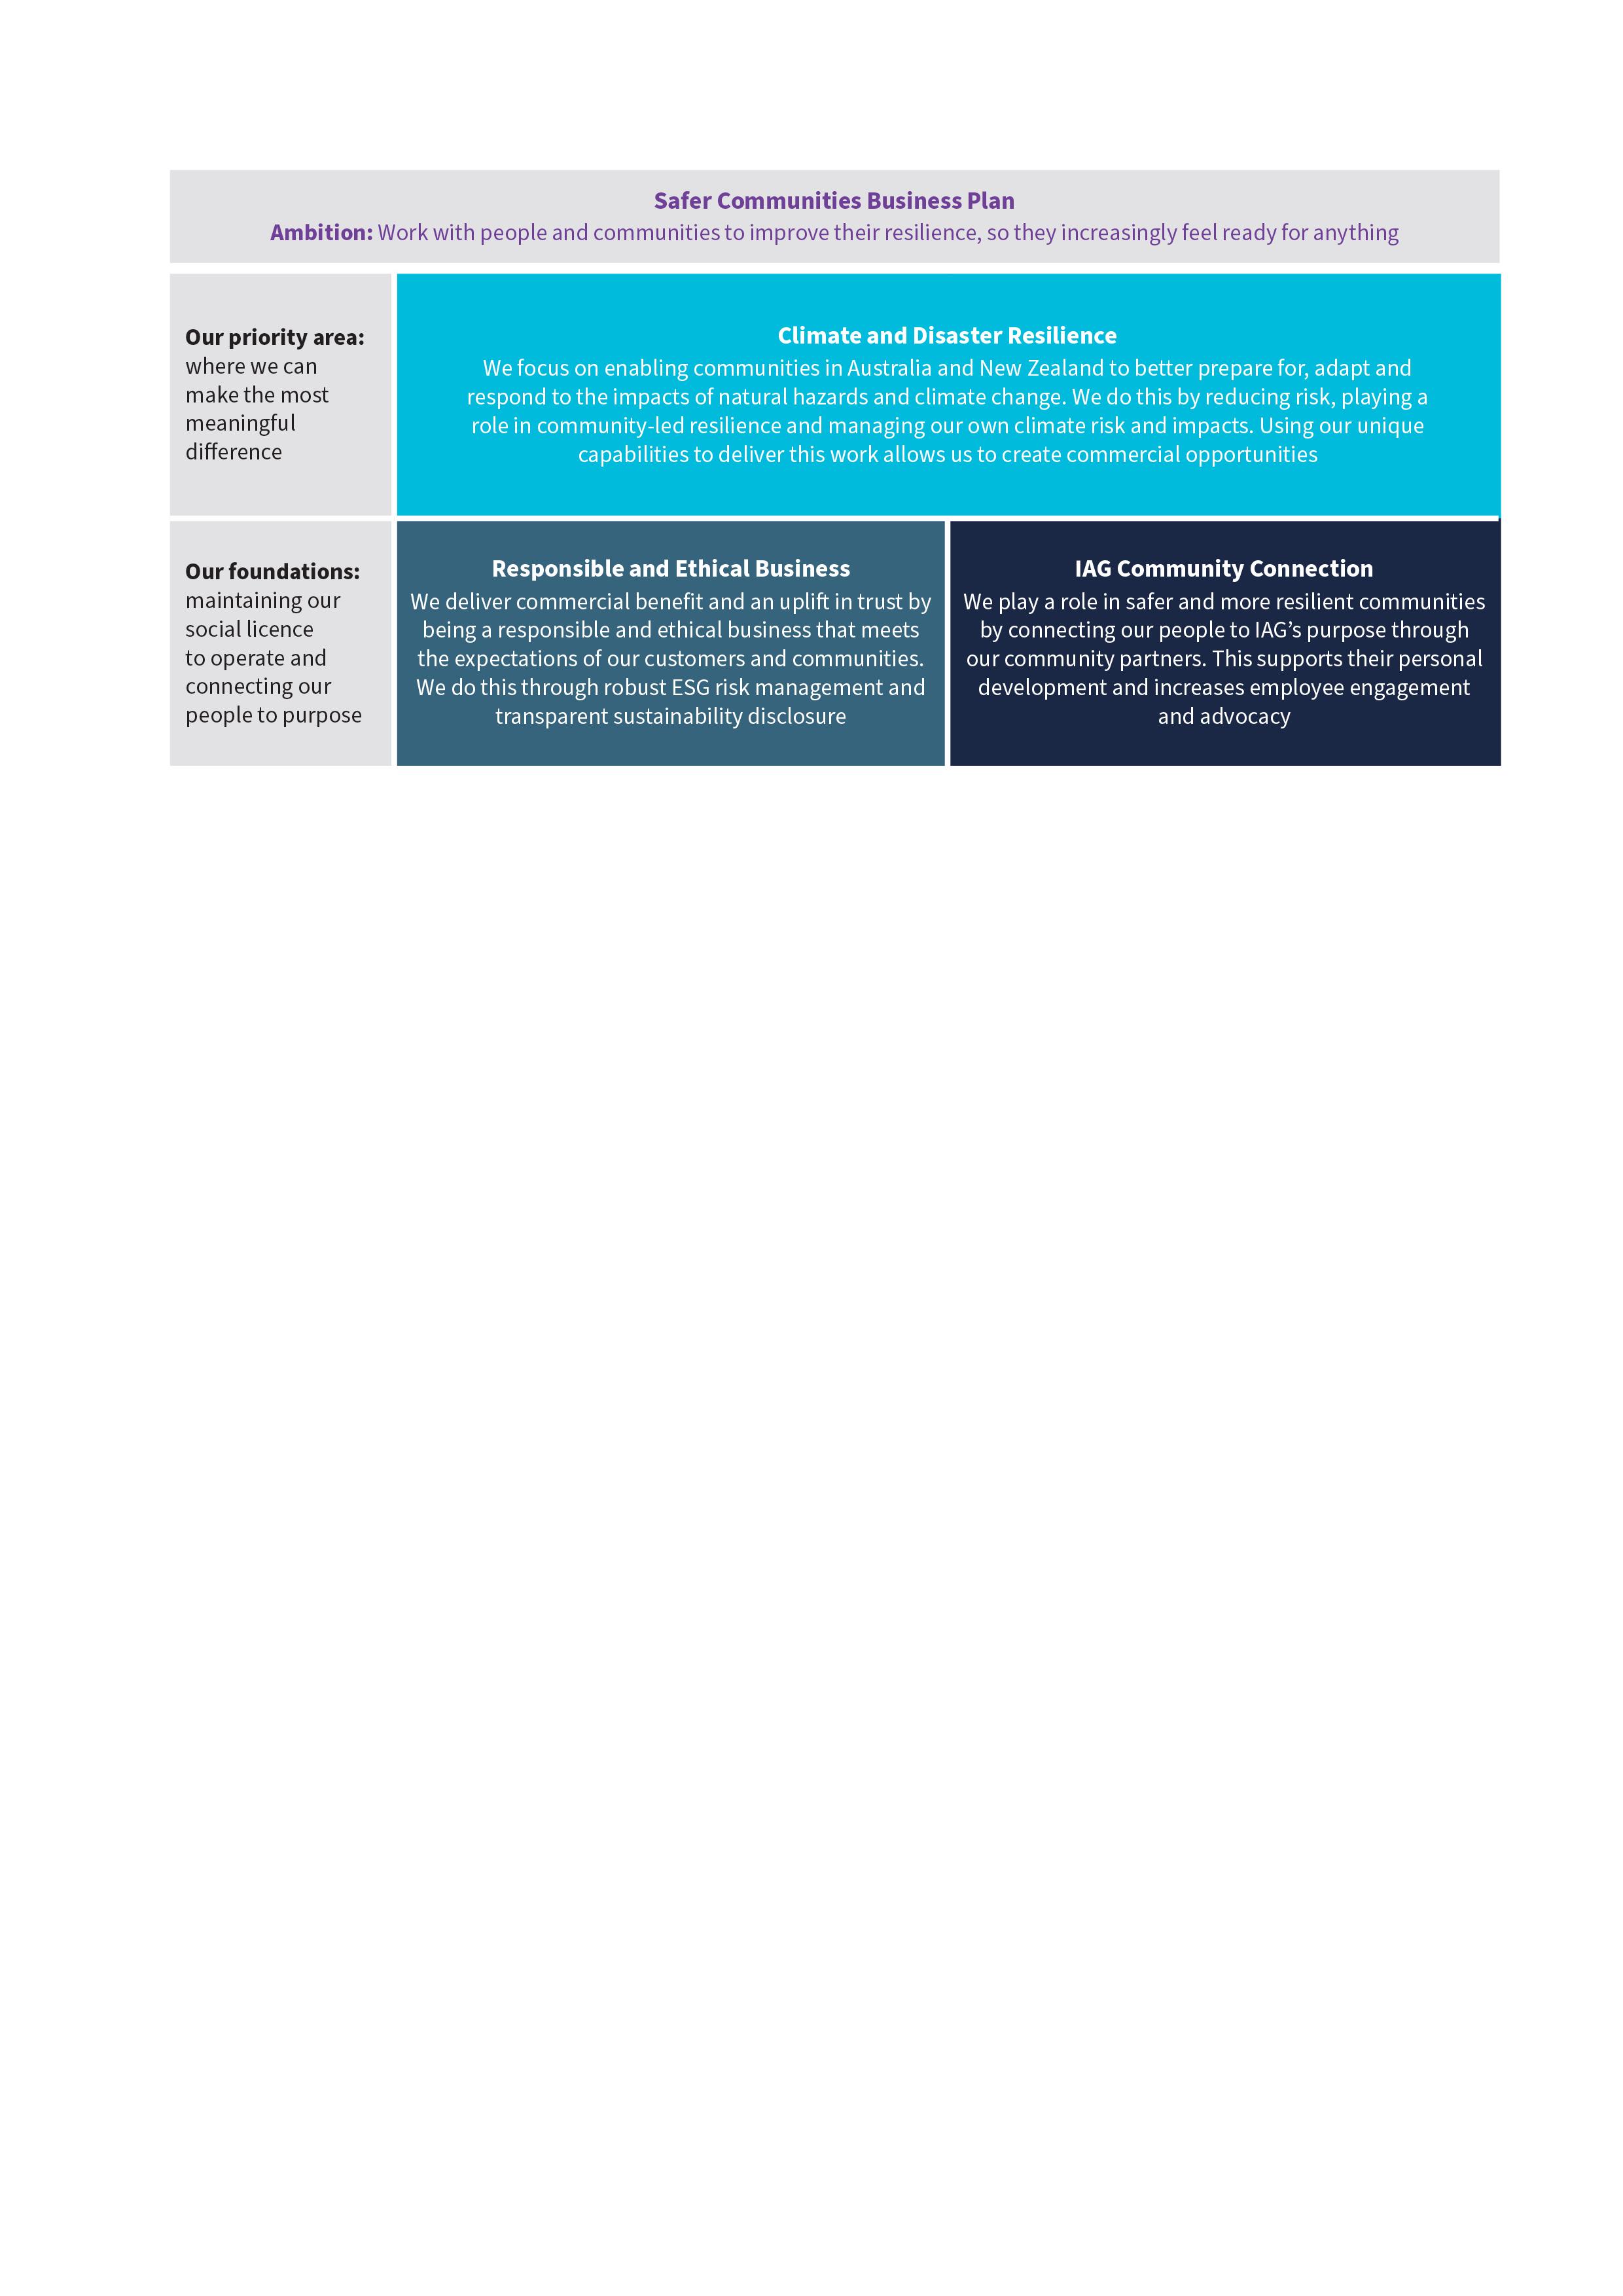 Safer communities business plan graphic